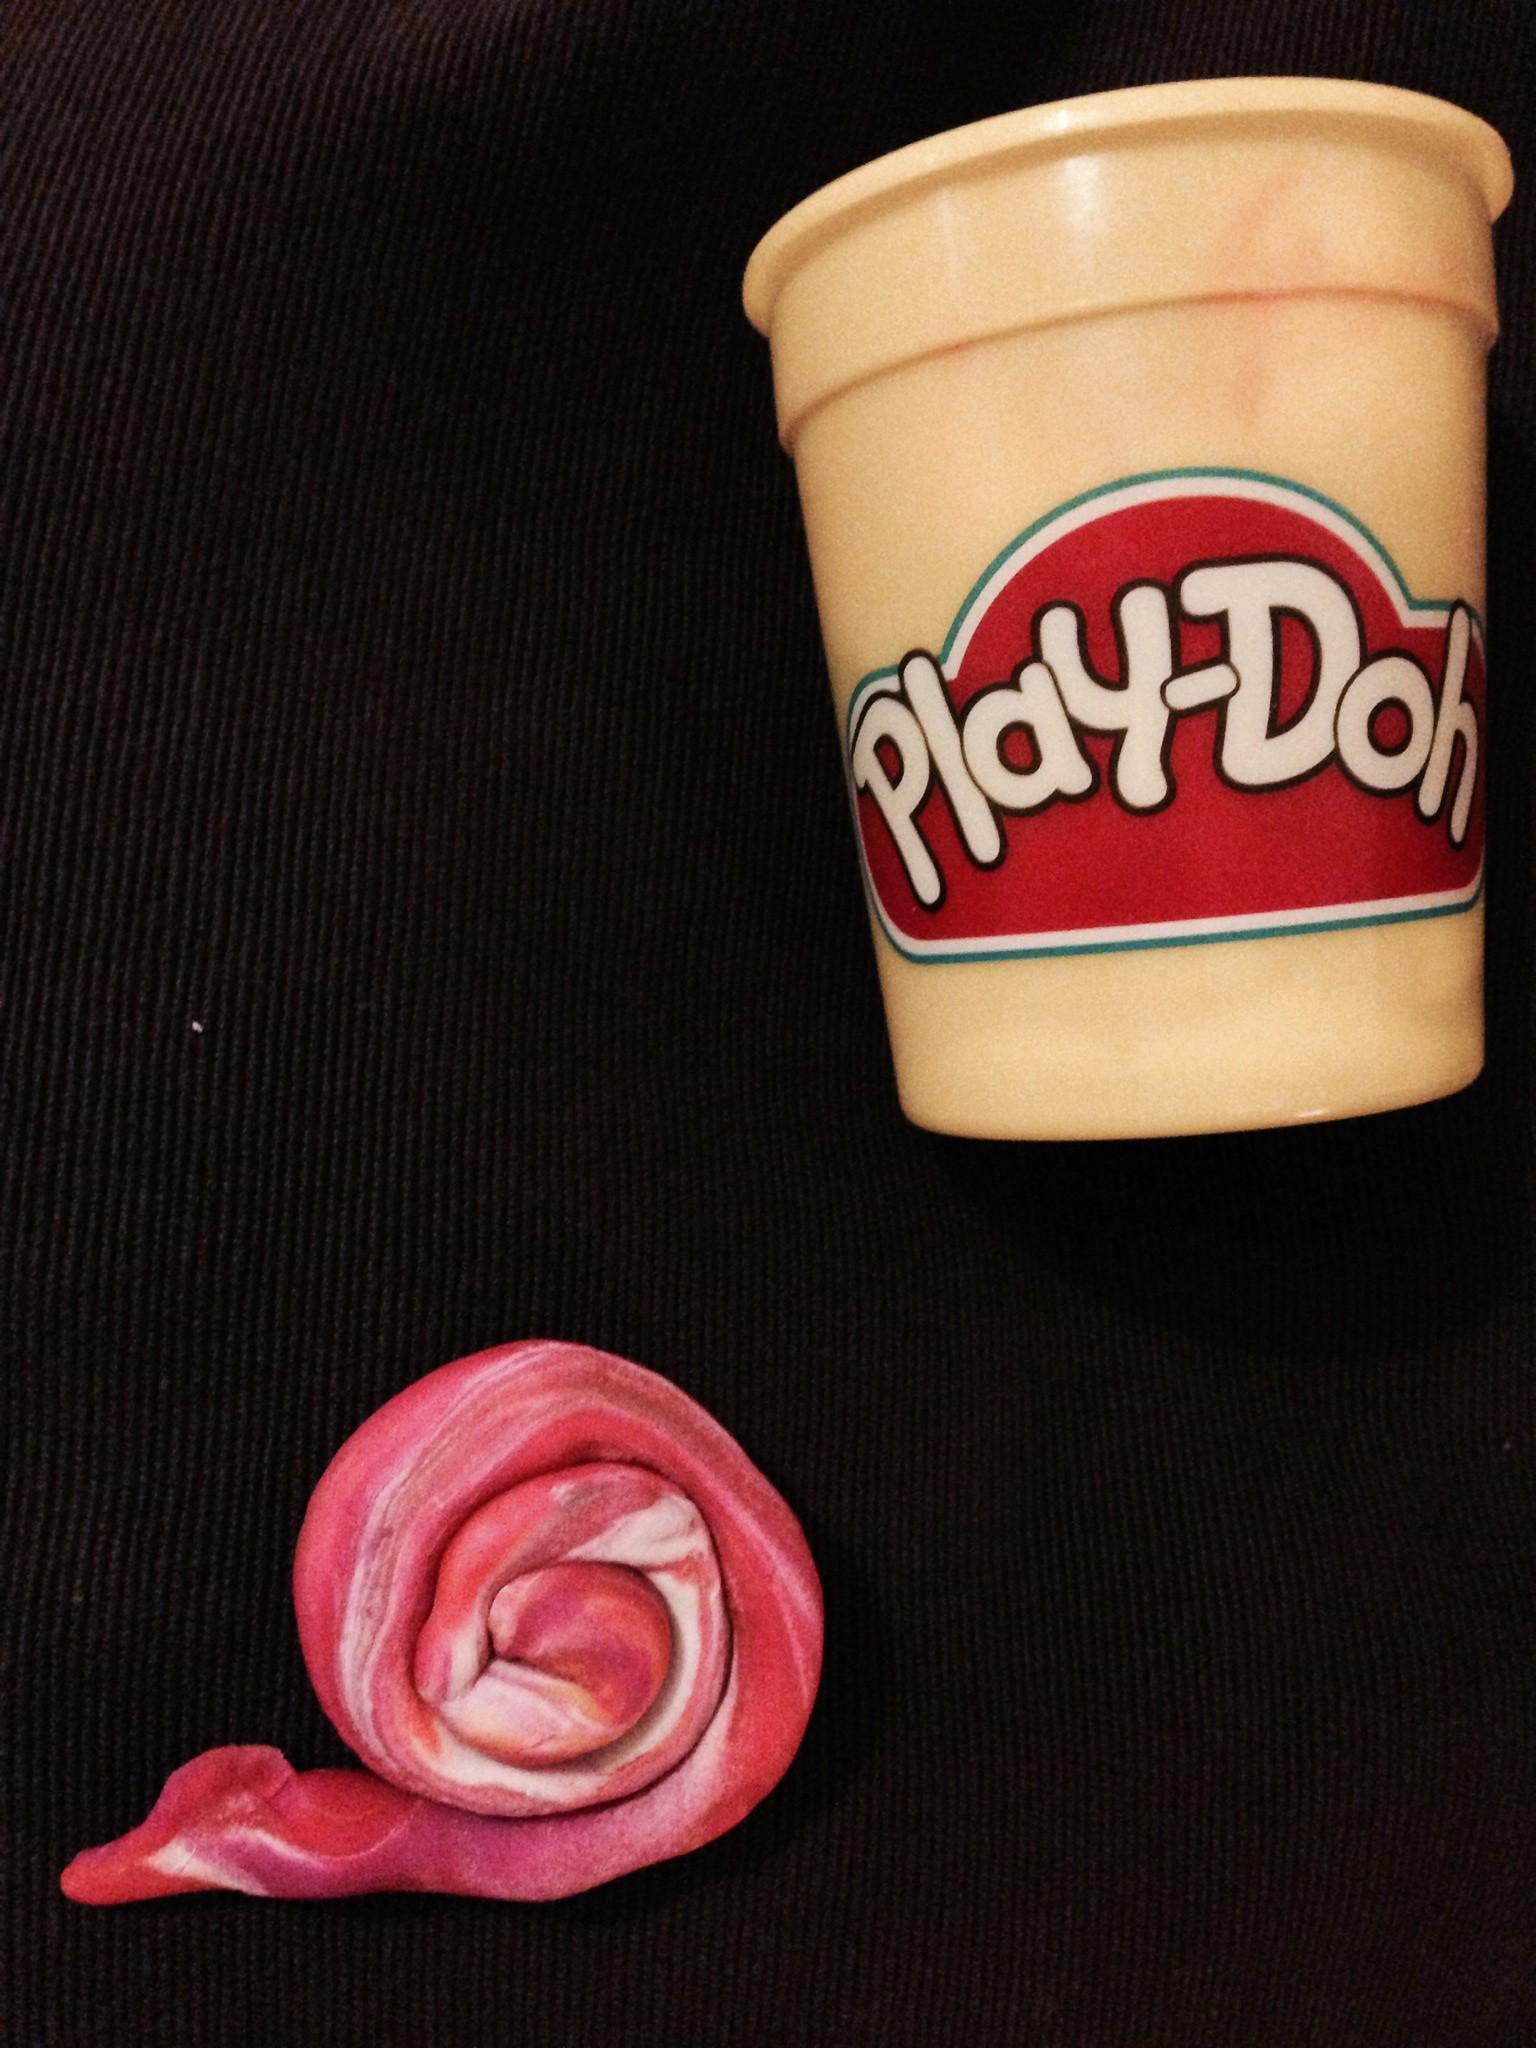 Play-Doh snail